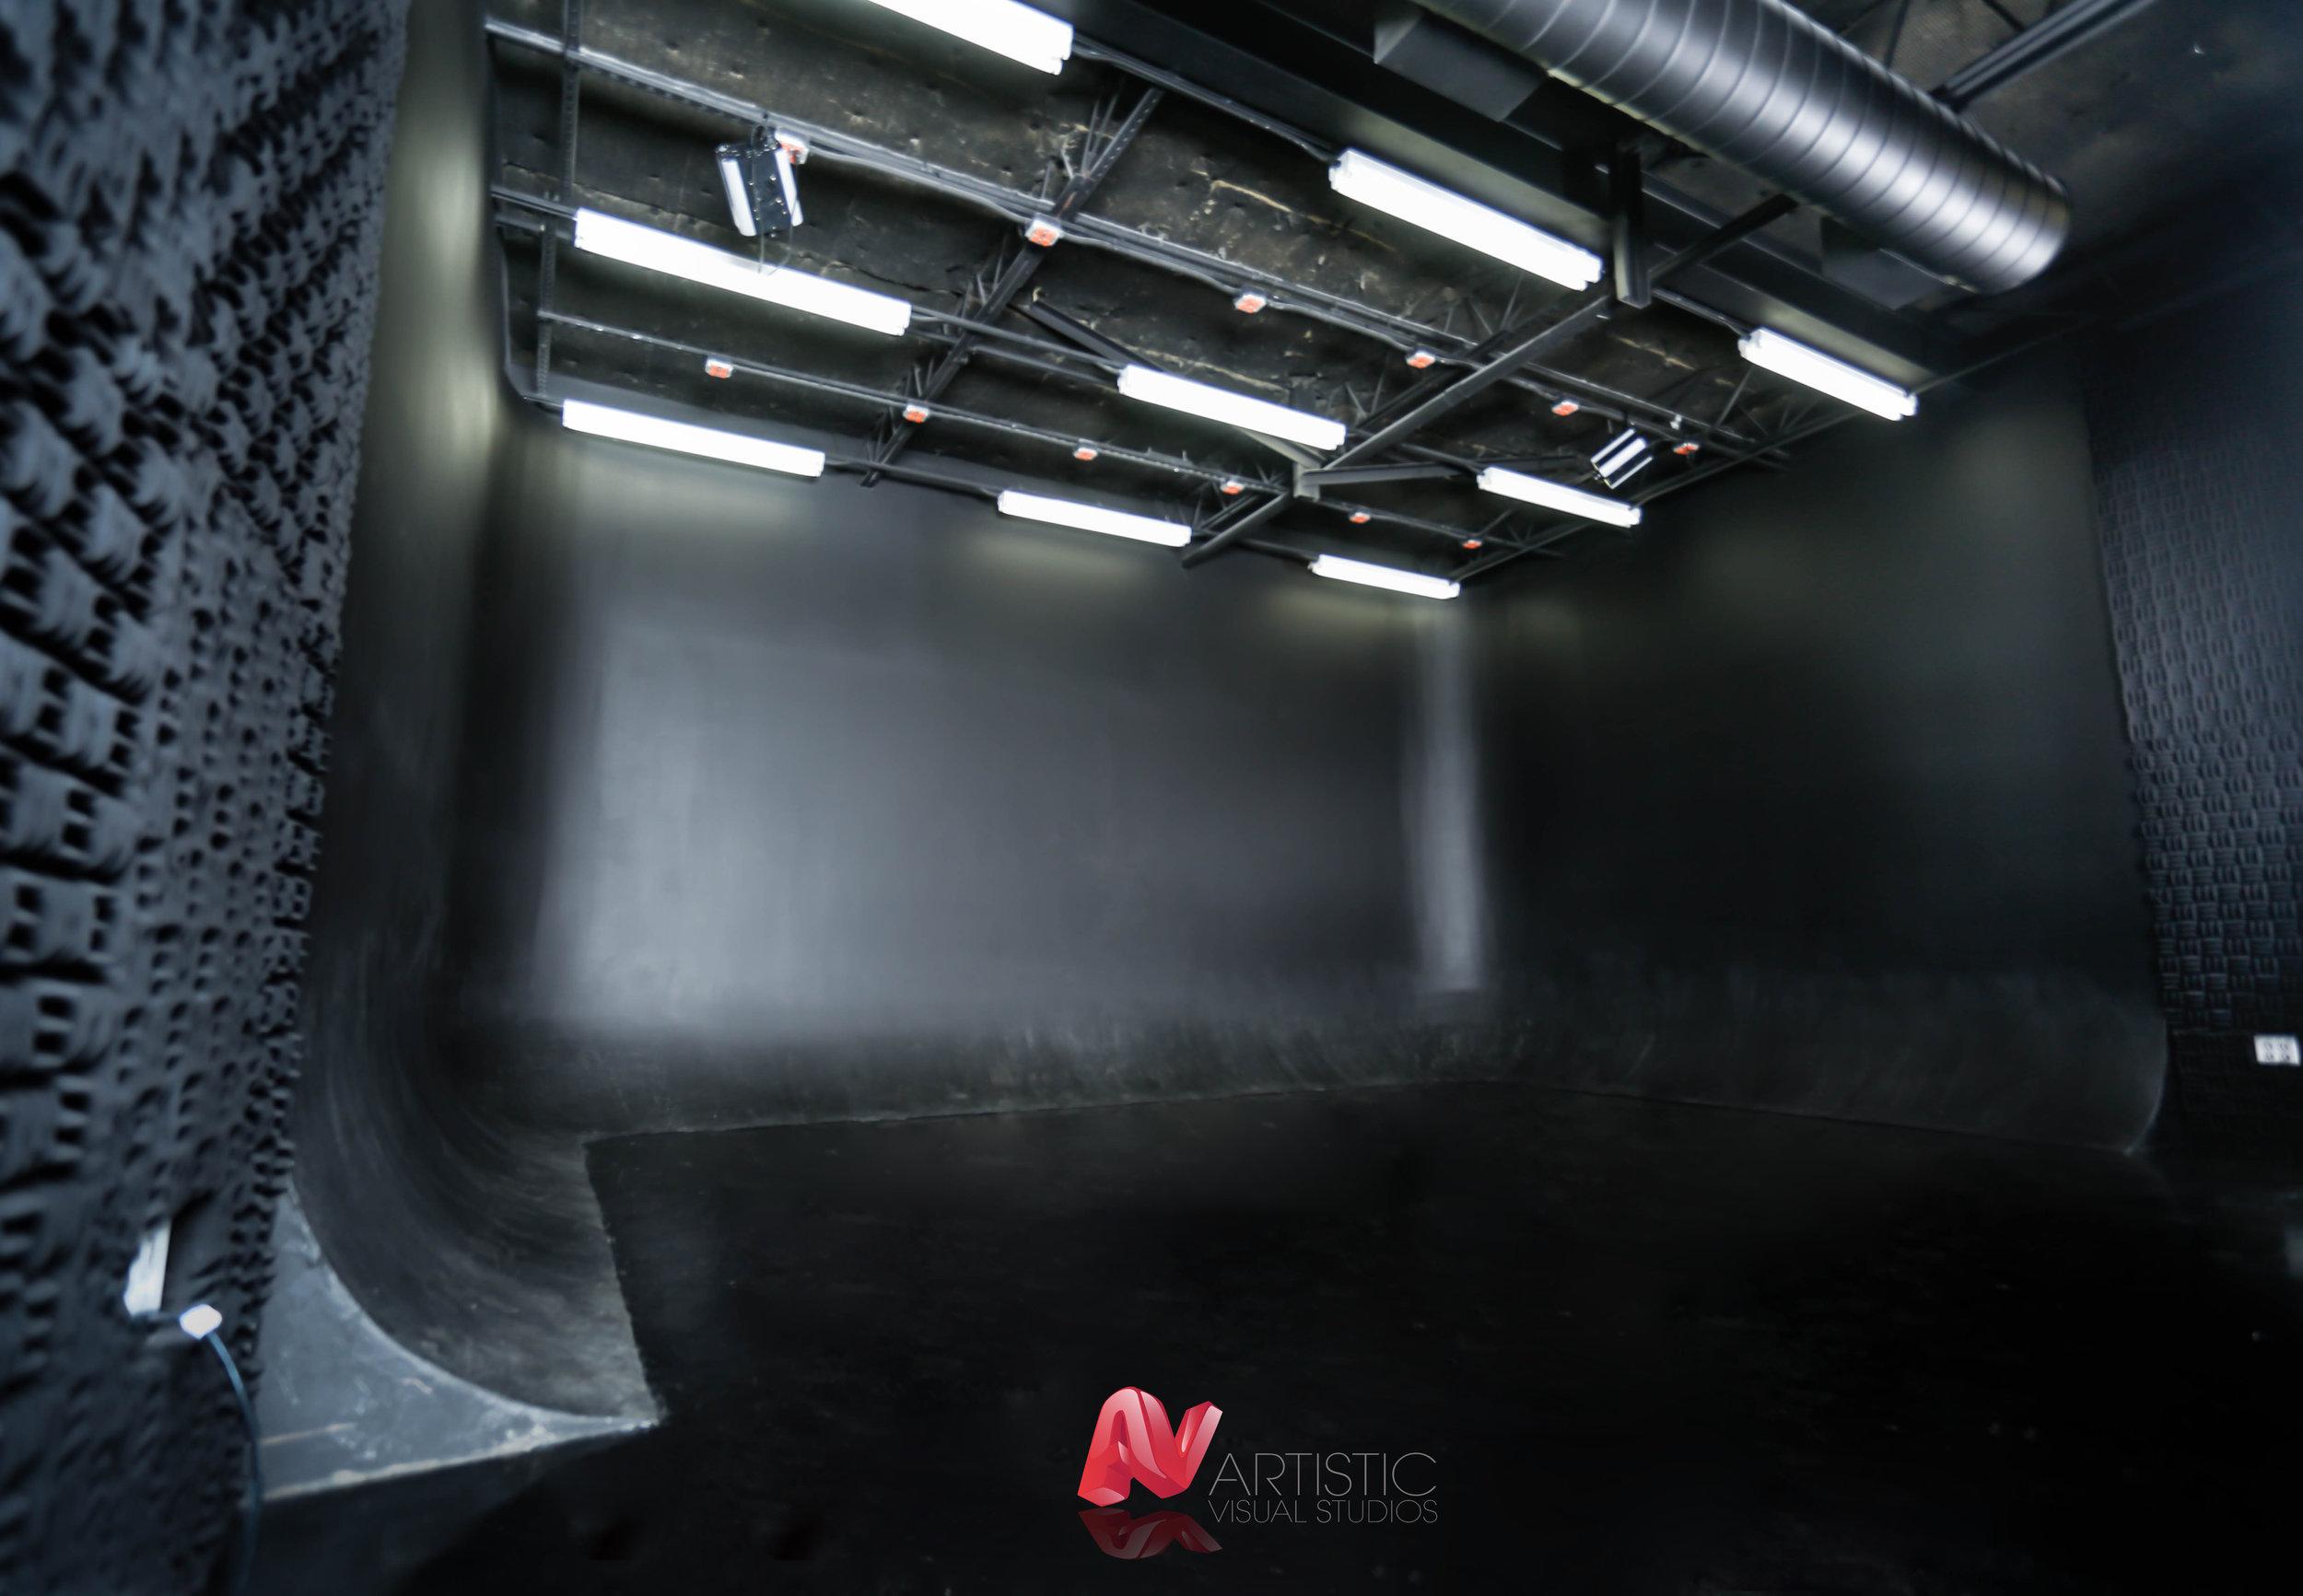 Artistic Visual Studio Black Box Photography Studio.jpg